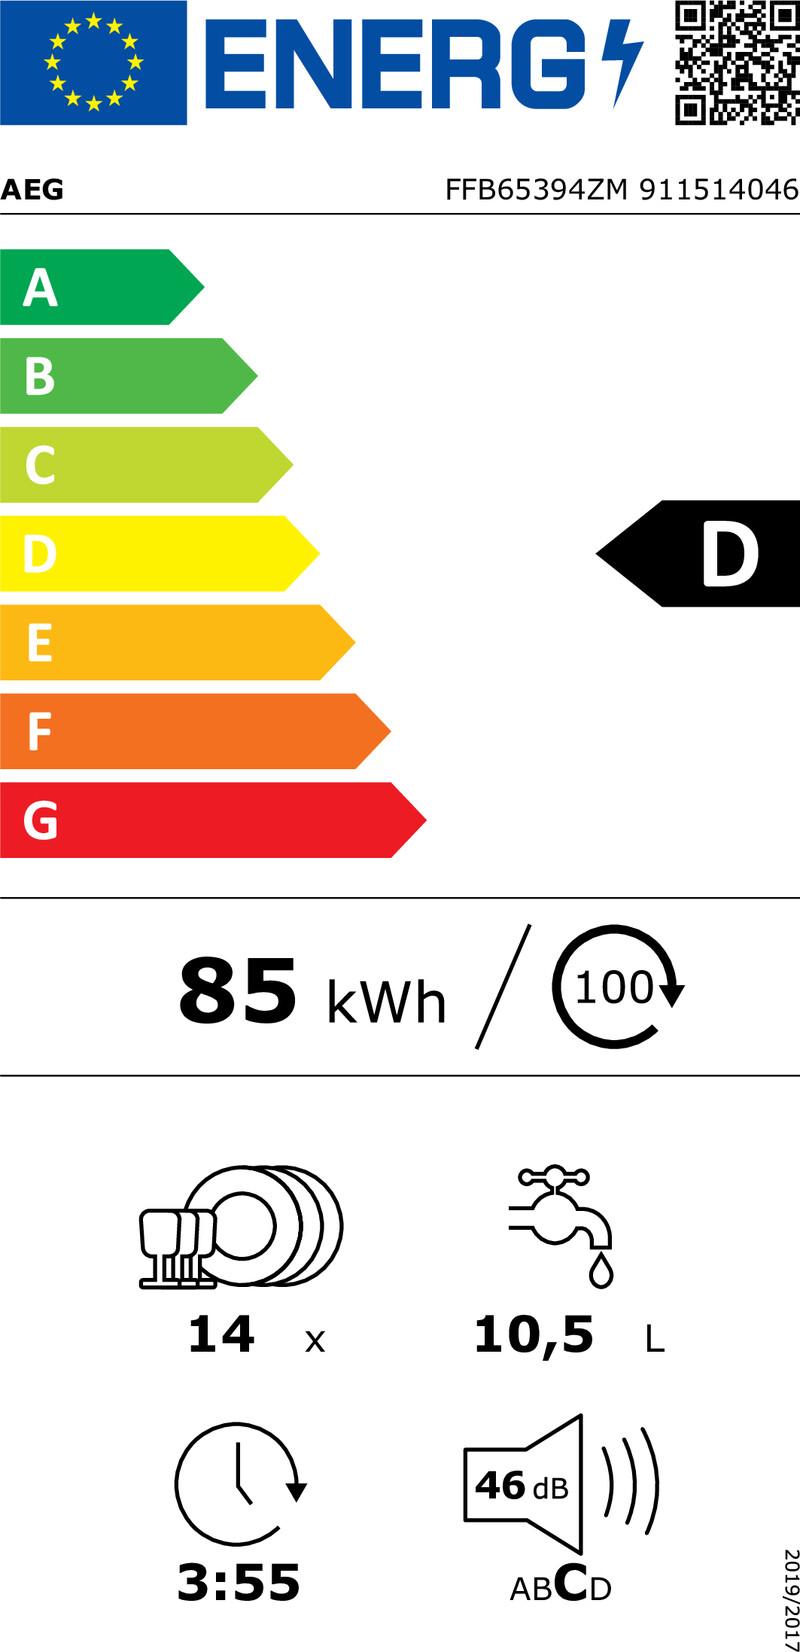 Energetický štítek AEG Mastery FFB65394ZM